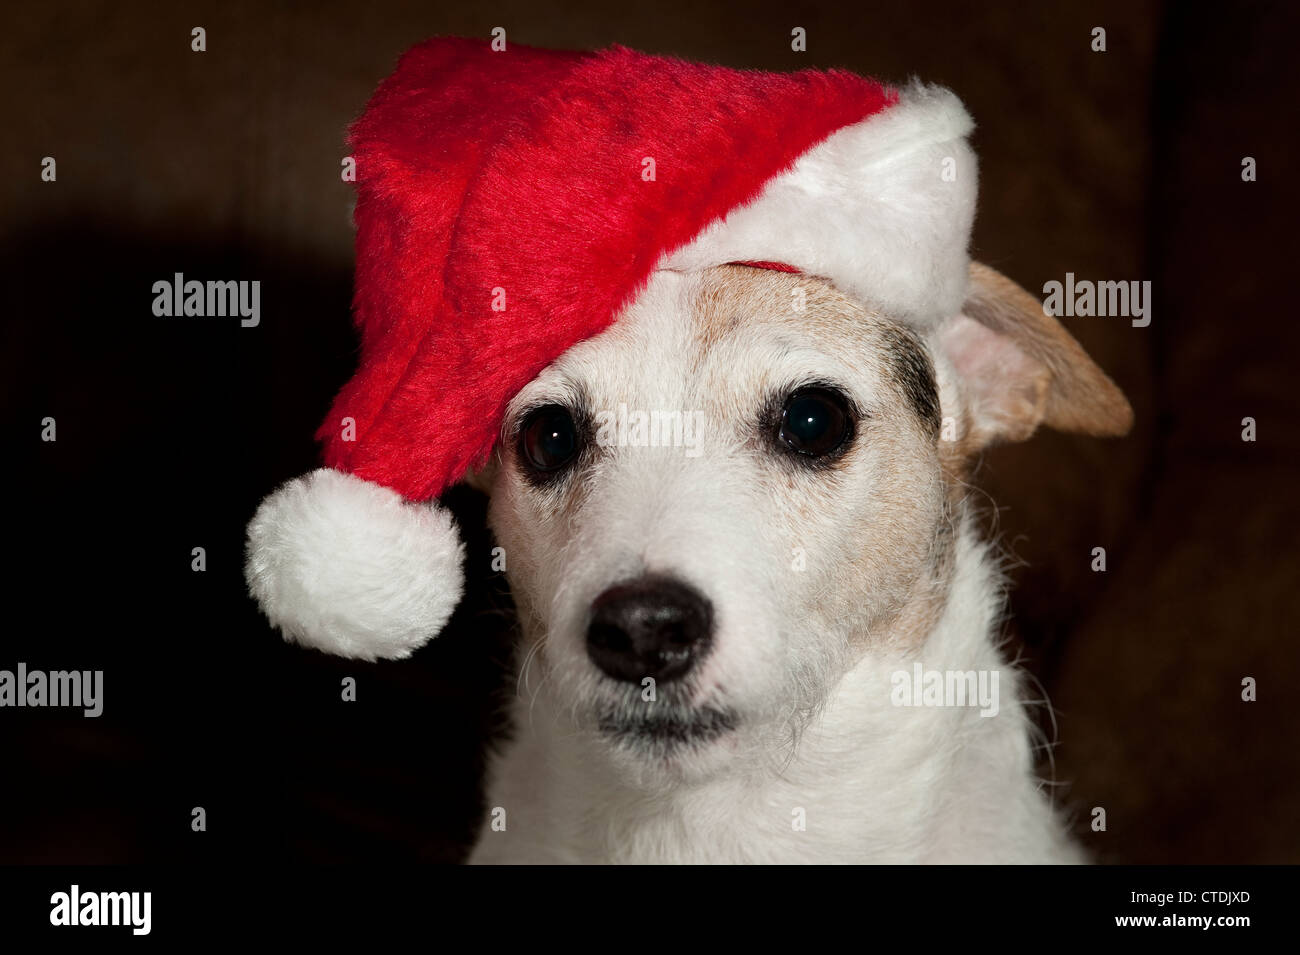 Jack Russell Terrier wearing Santa Hat portrait interior. - Stock Image